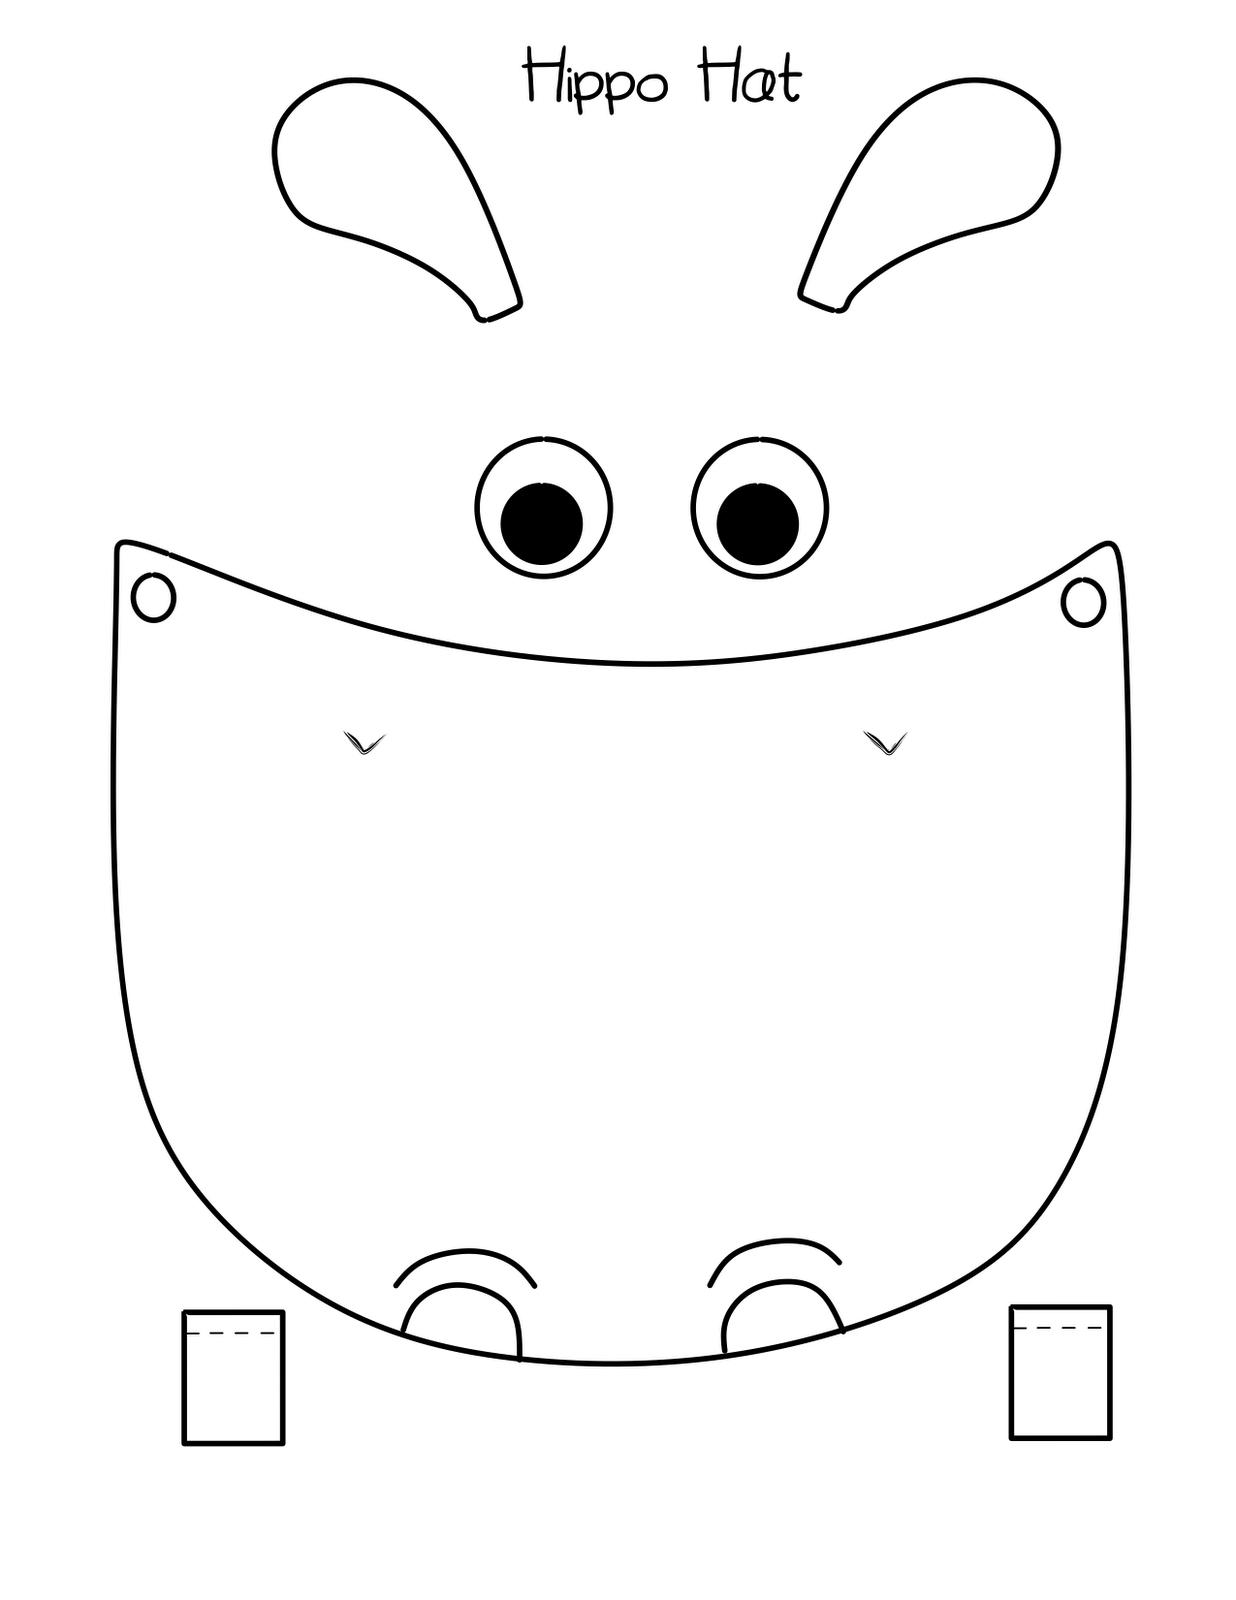 hippo face template - HD1236×1600